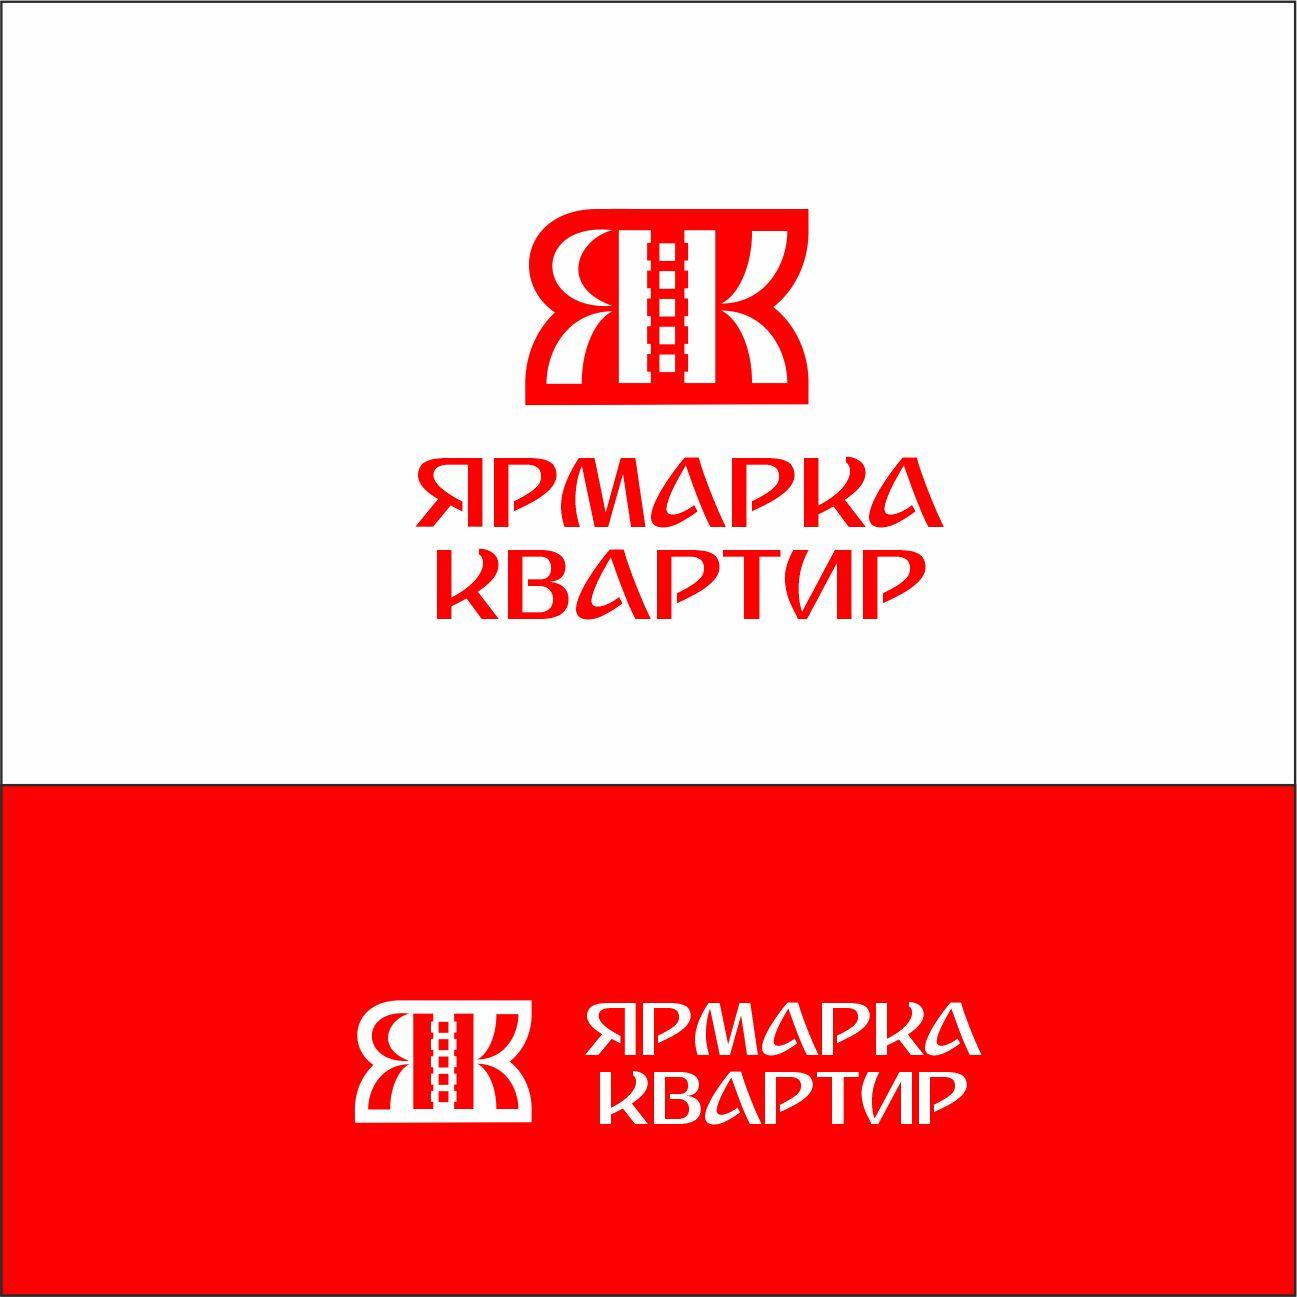 Создание логотипа, с вариантами для визитки и листовки фото f_98560042e5442e47.jpg